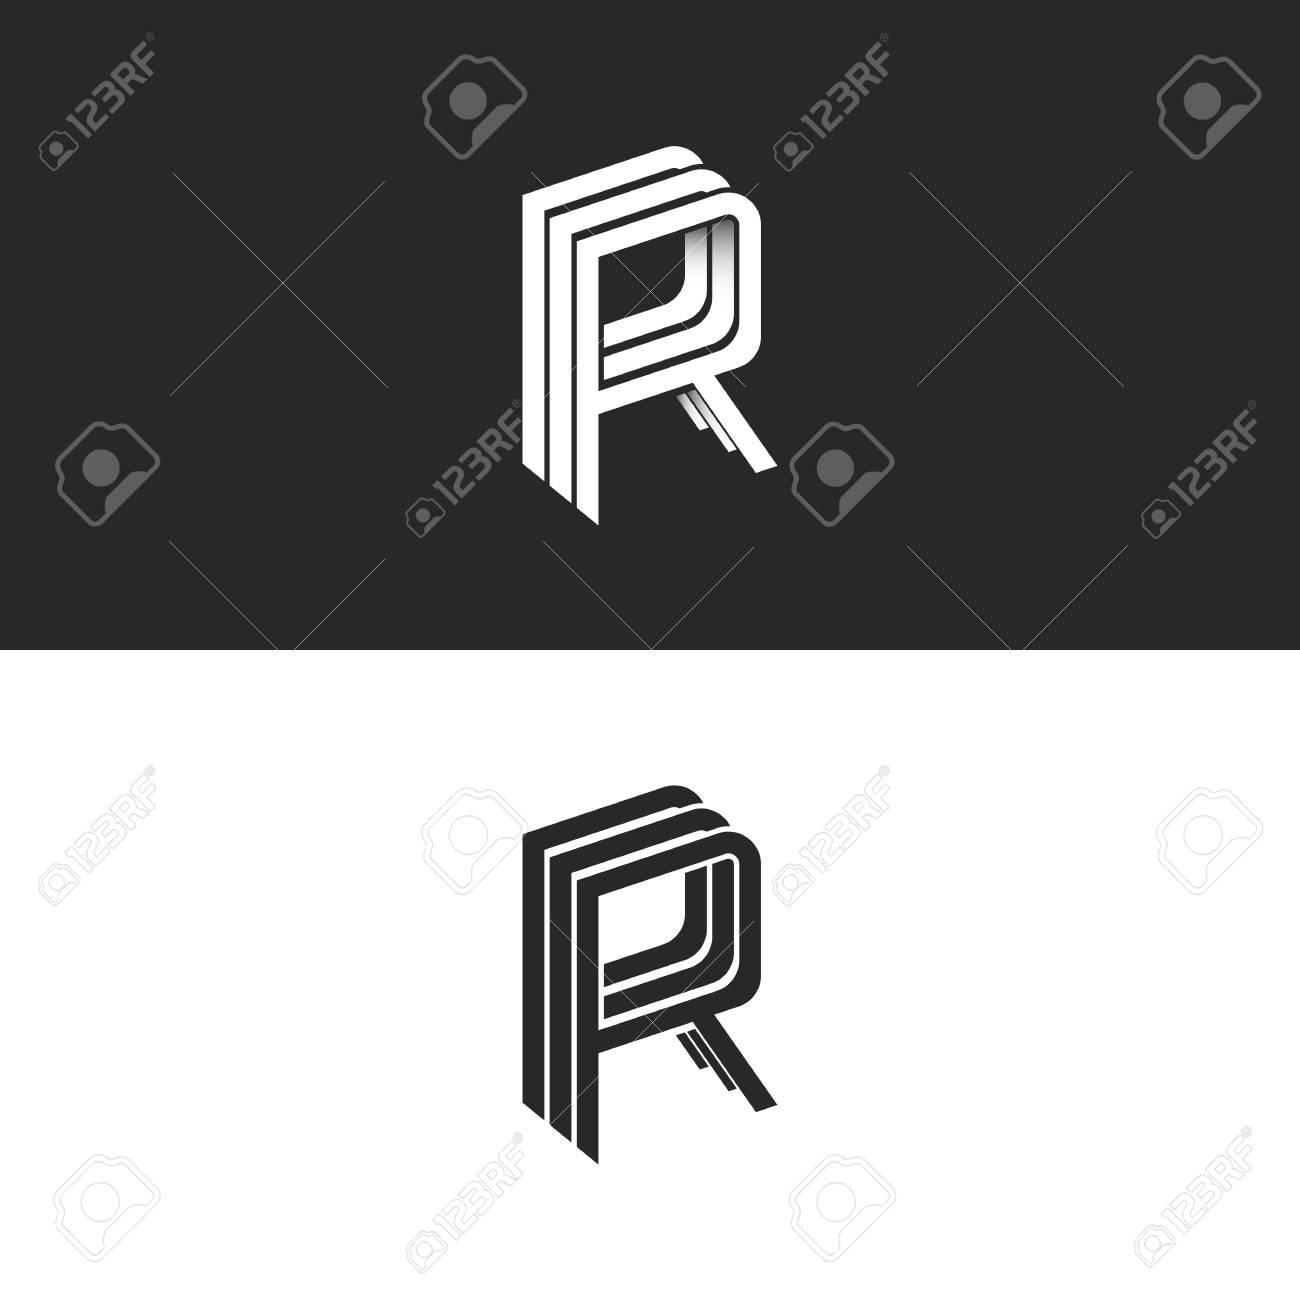 Letter r logo isometric emblem rrr symbol black and white letter r logo isometric emblem rrr symbol black and white monogram hipster design element template biocorpaavc